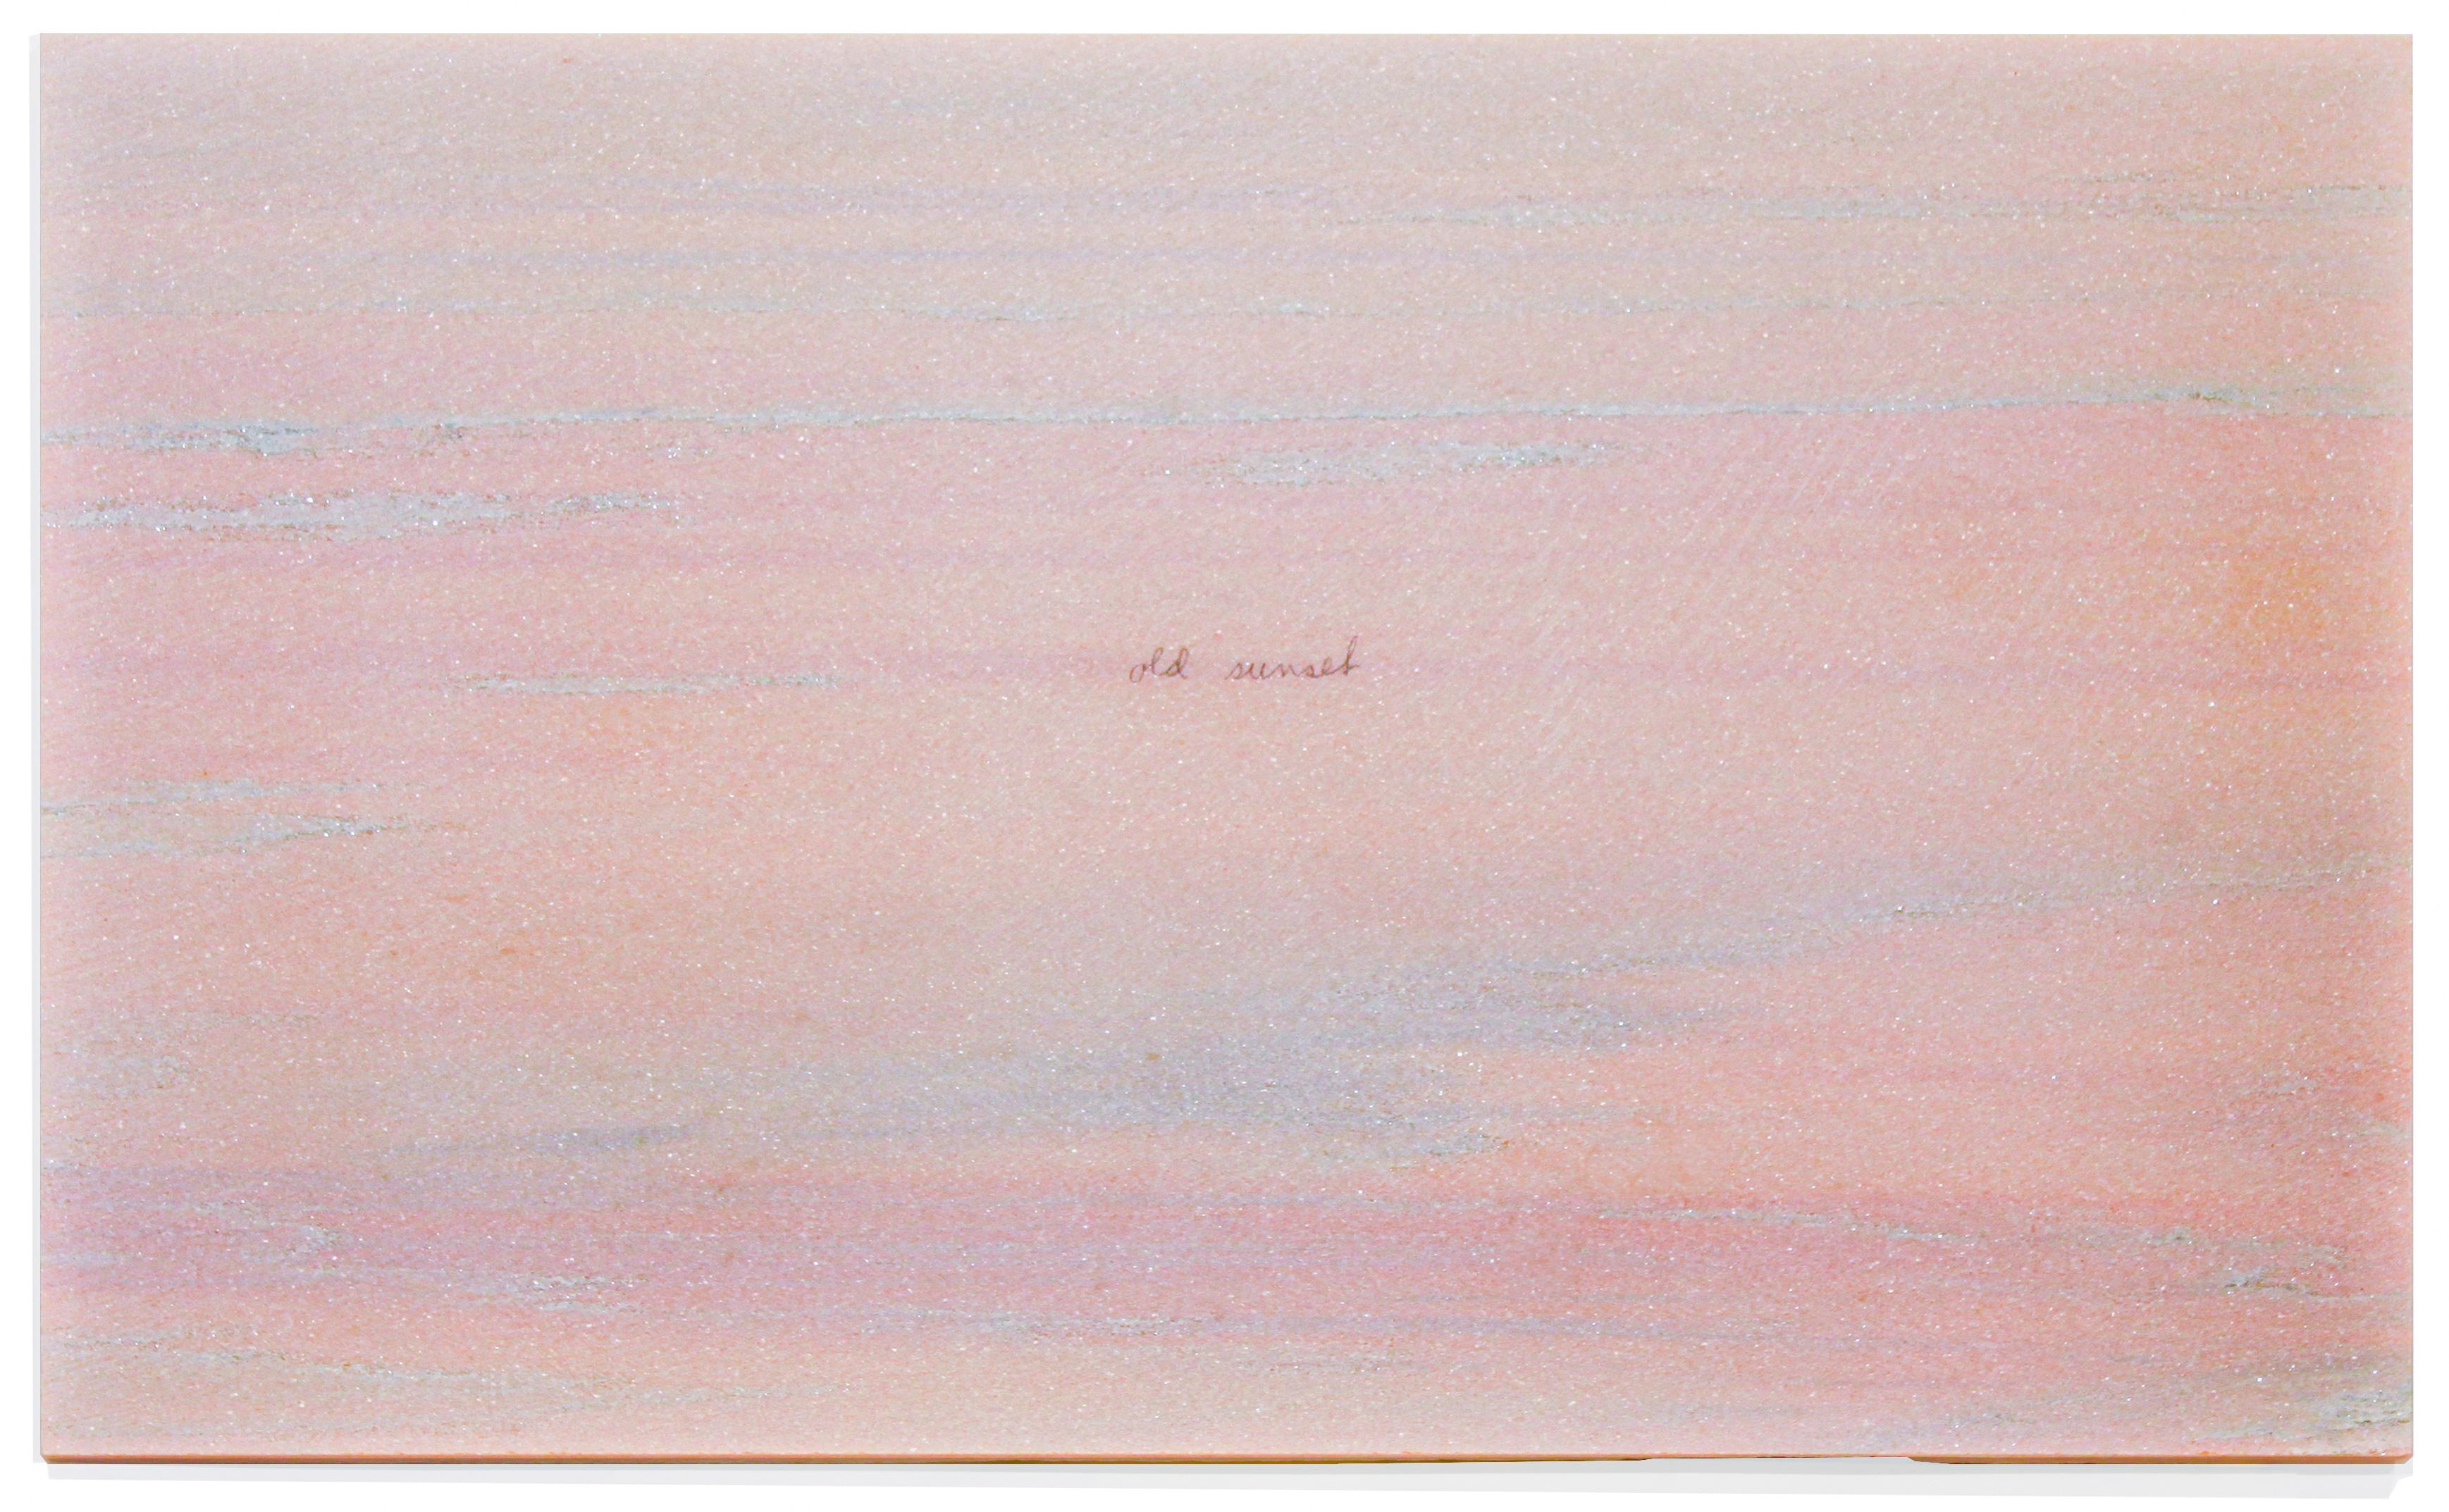 Galerie Barbara Thumm \ New Viewings #37 \ New Viewings #37